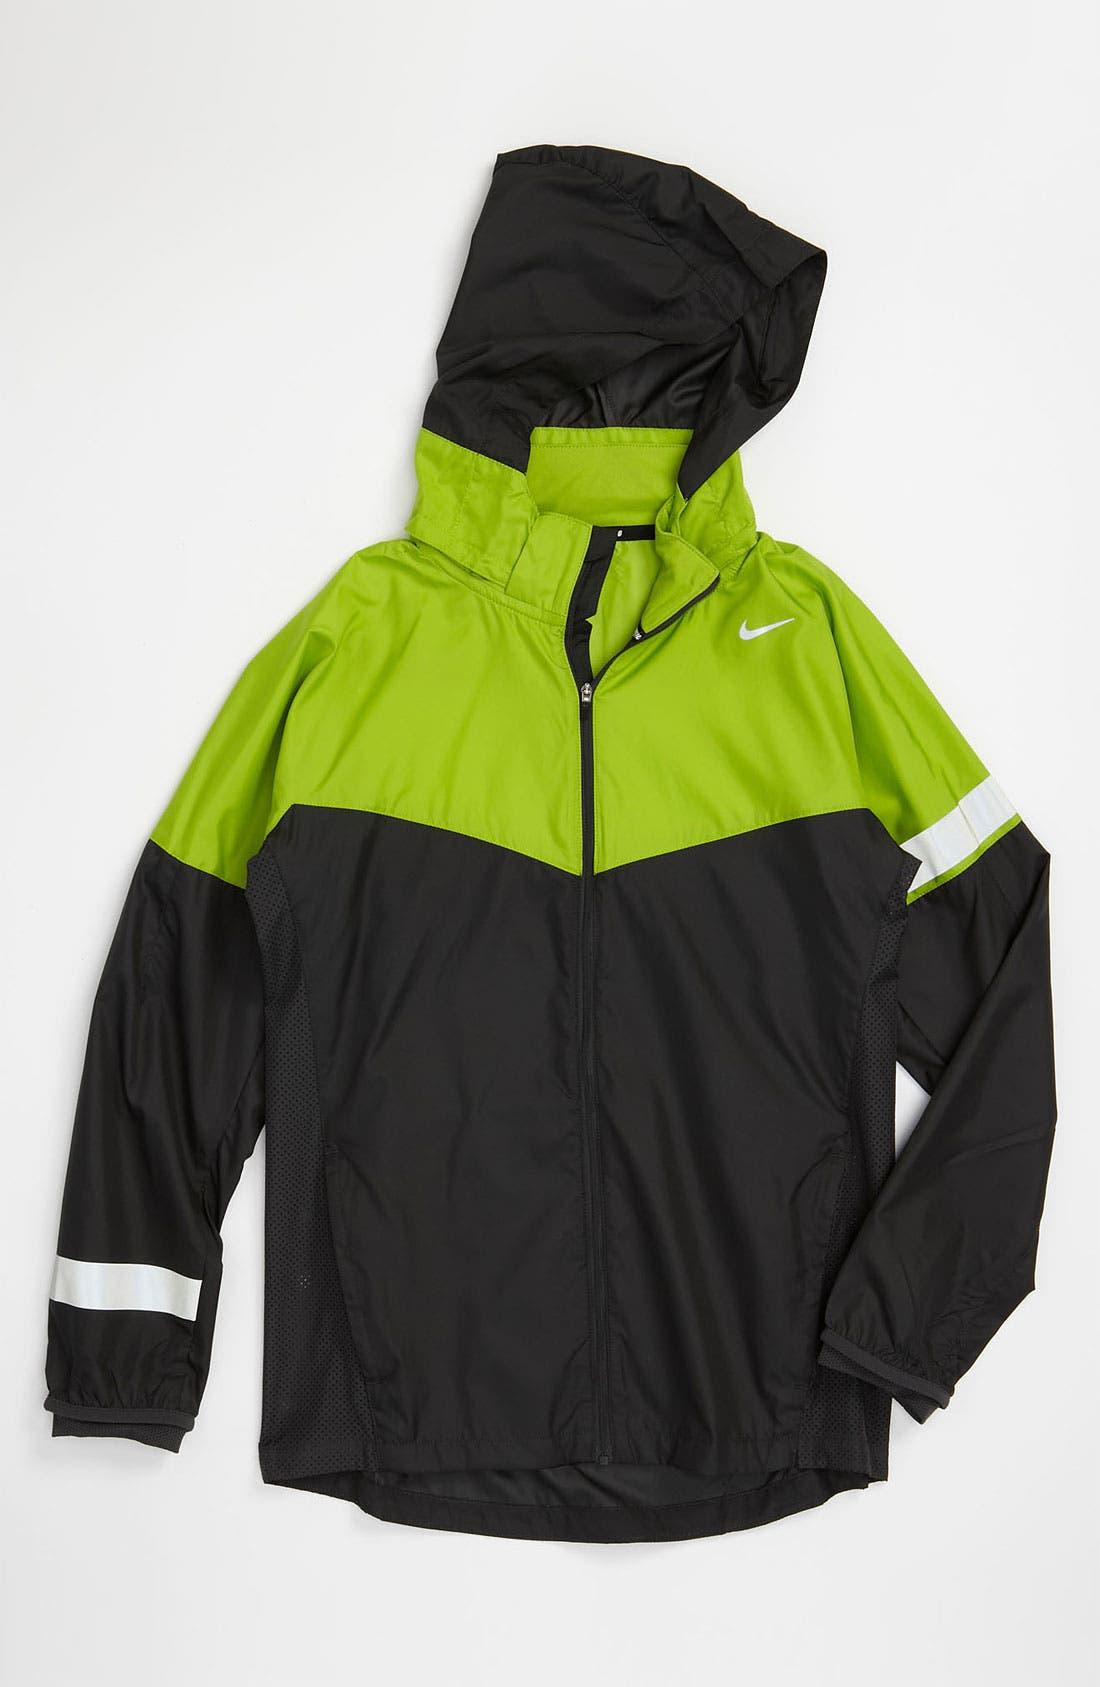 Alternate Image 1 Selected - Nike 'Vapor' Jacket (Big Boys)